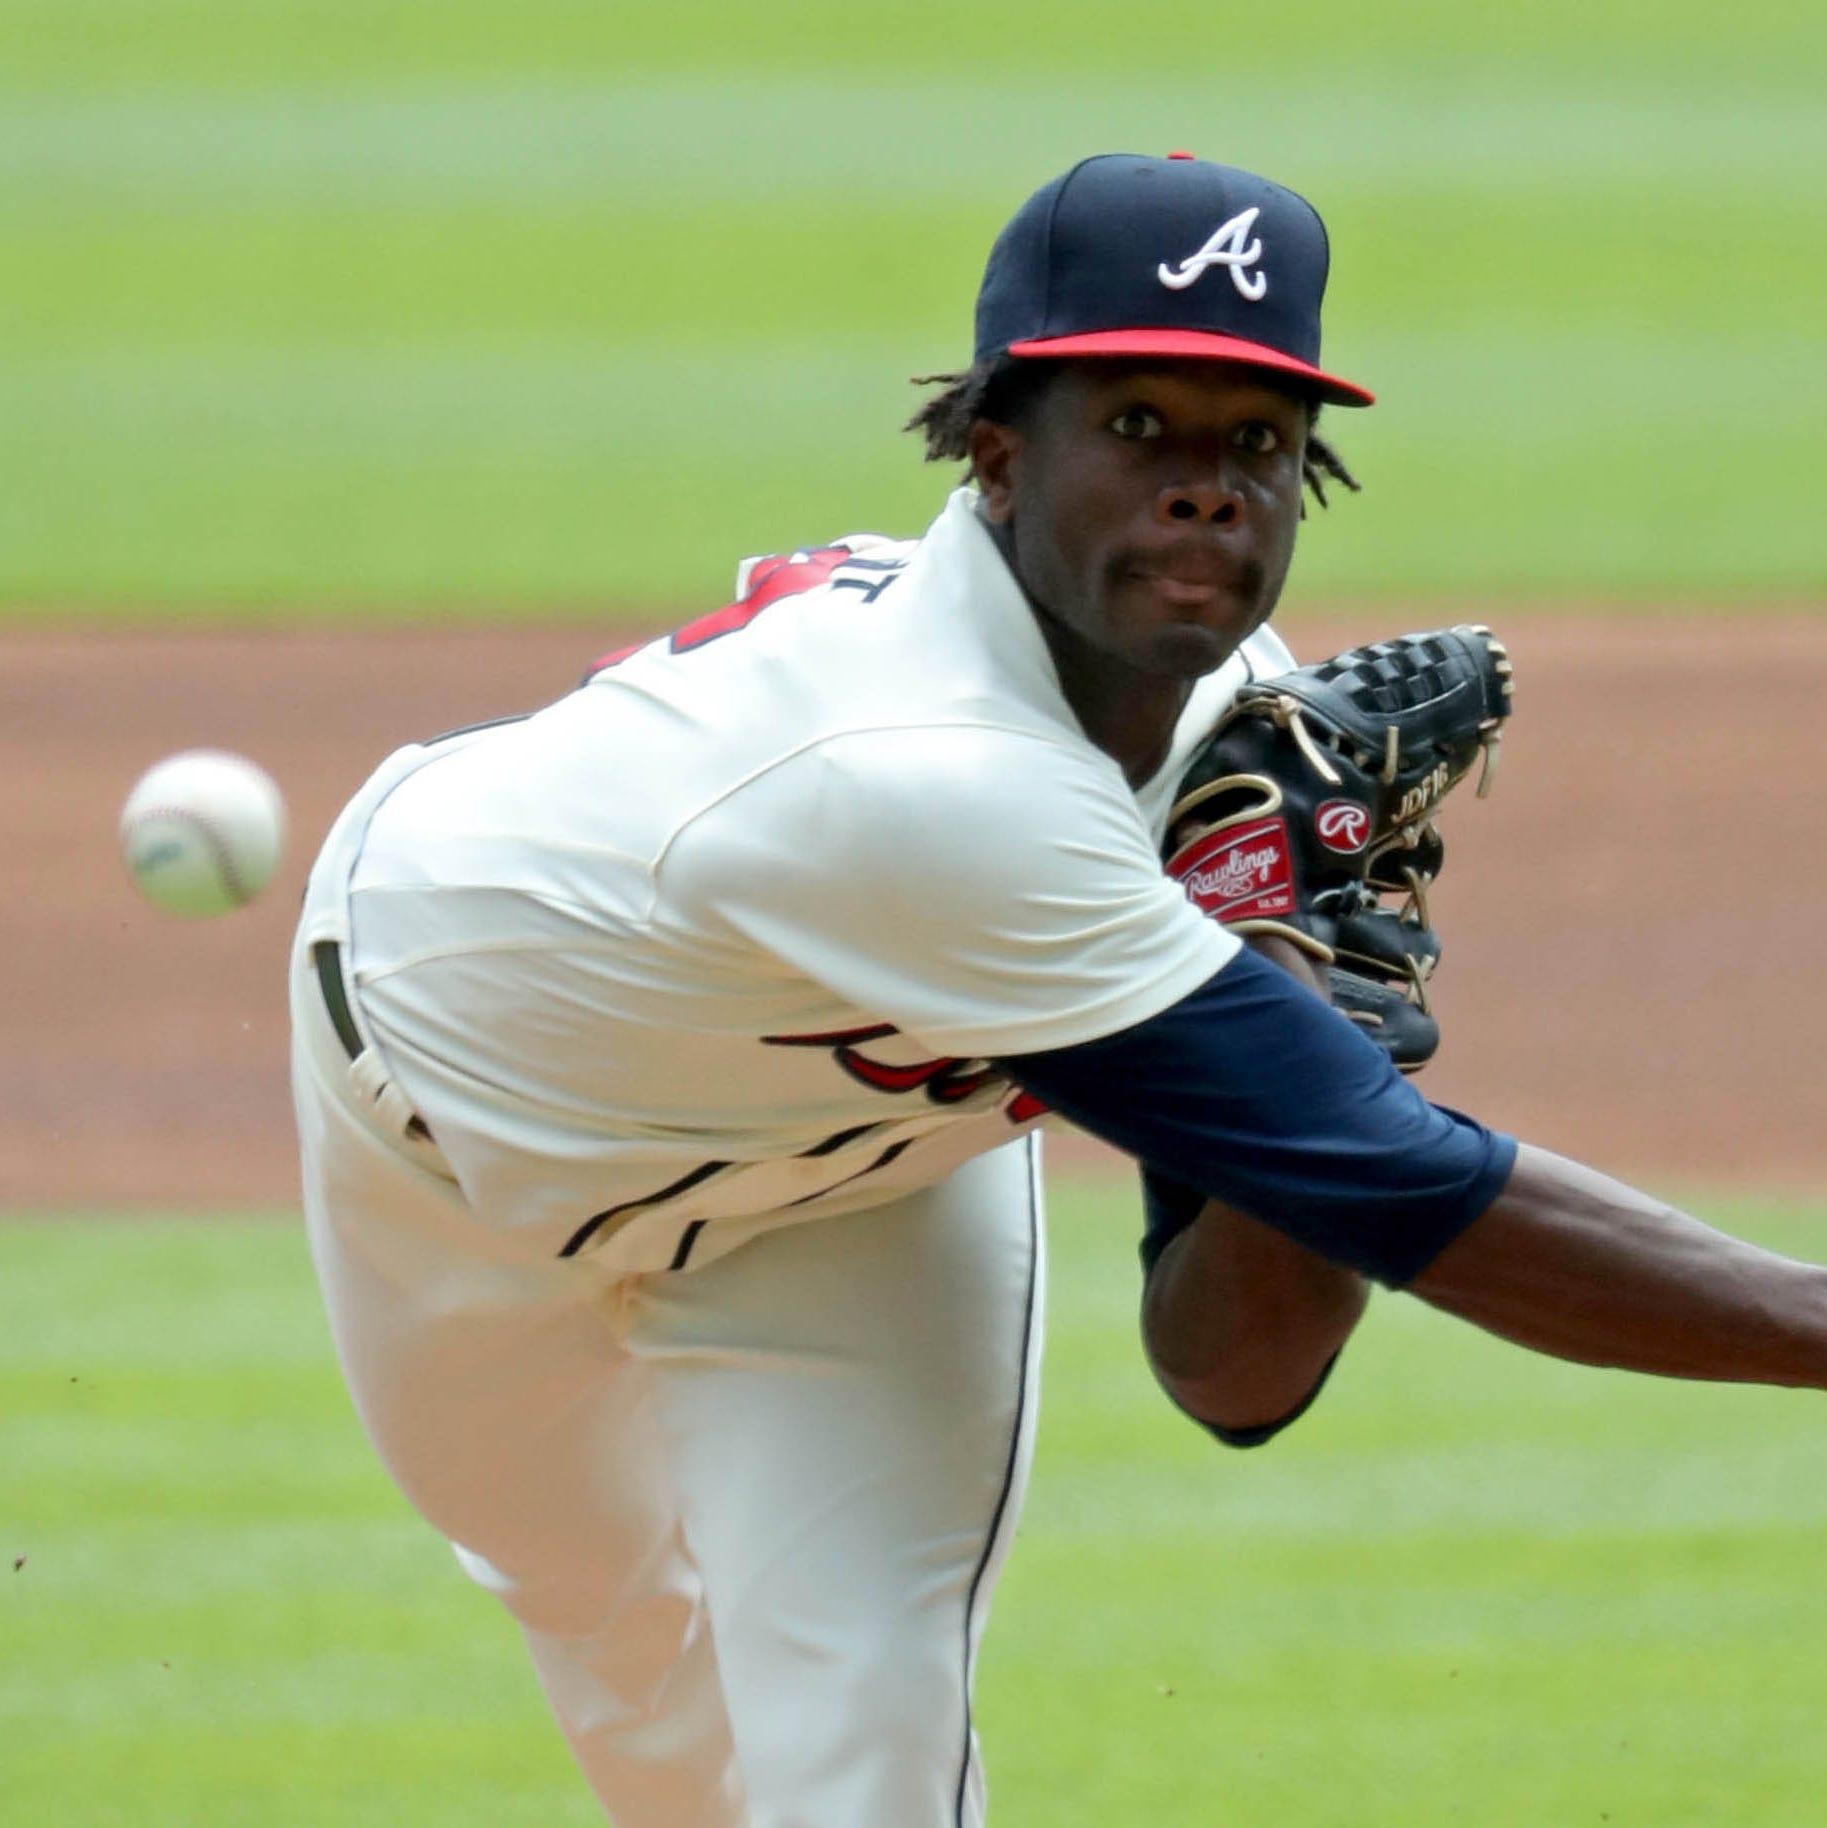 Former Diamondbacks prospect Touki Toussaint shines in MLB debut for Atlanta Braves